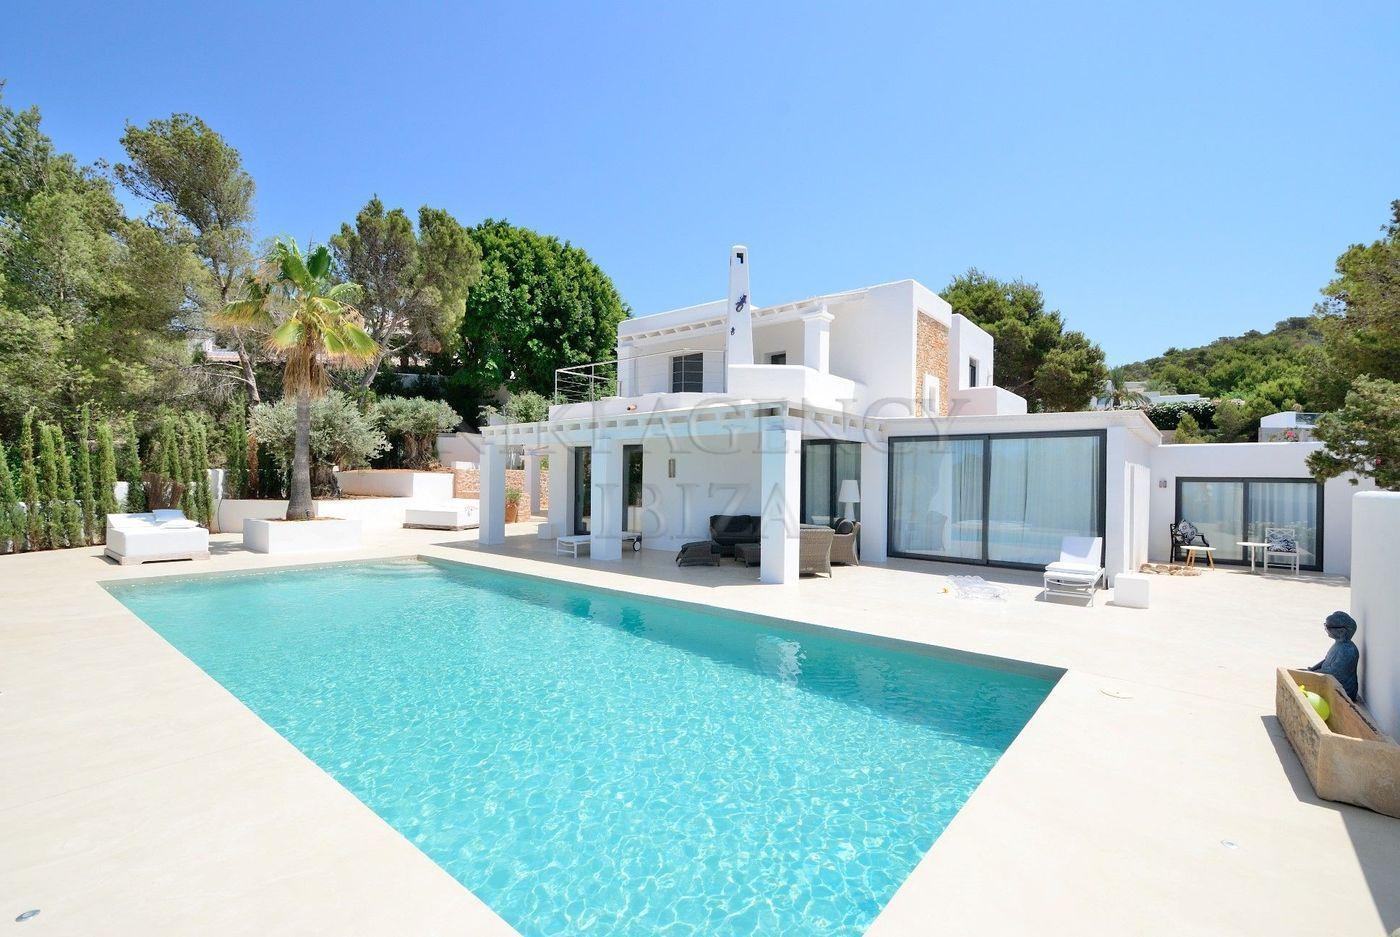 1. House for sale in Sant Josep de sa Talaia Ibiza - Fantastic 4 Bed Villa For Sale in Sant Josep de sa Talaia, Ibiza!